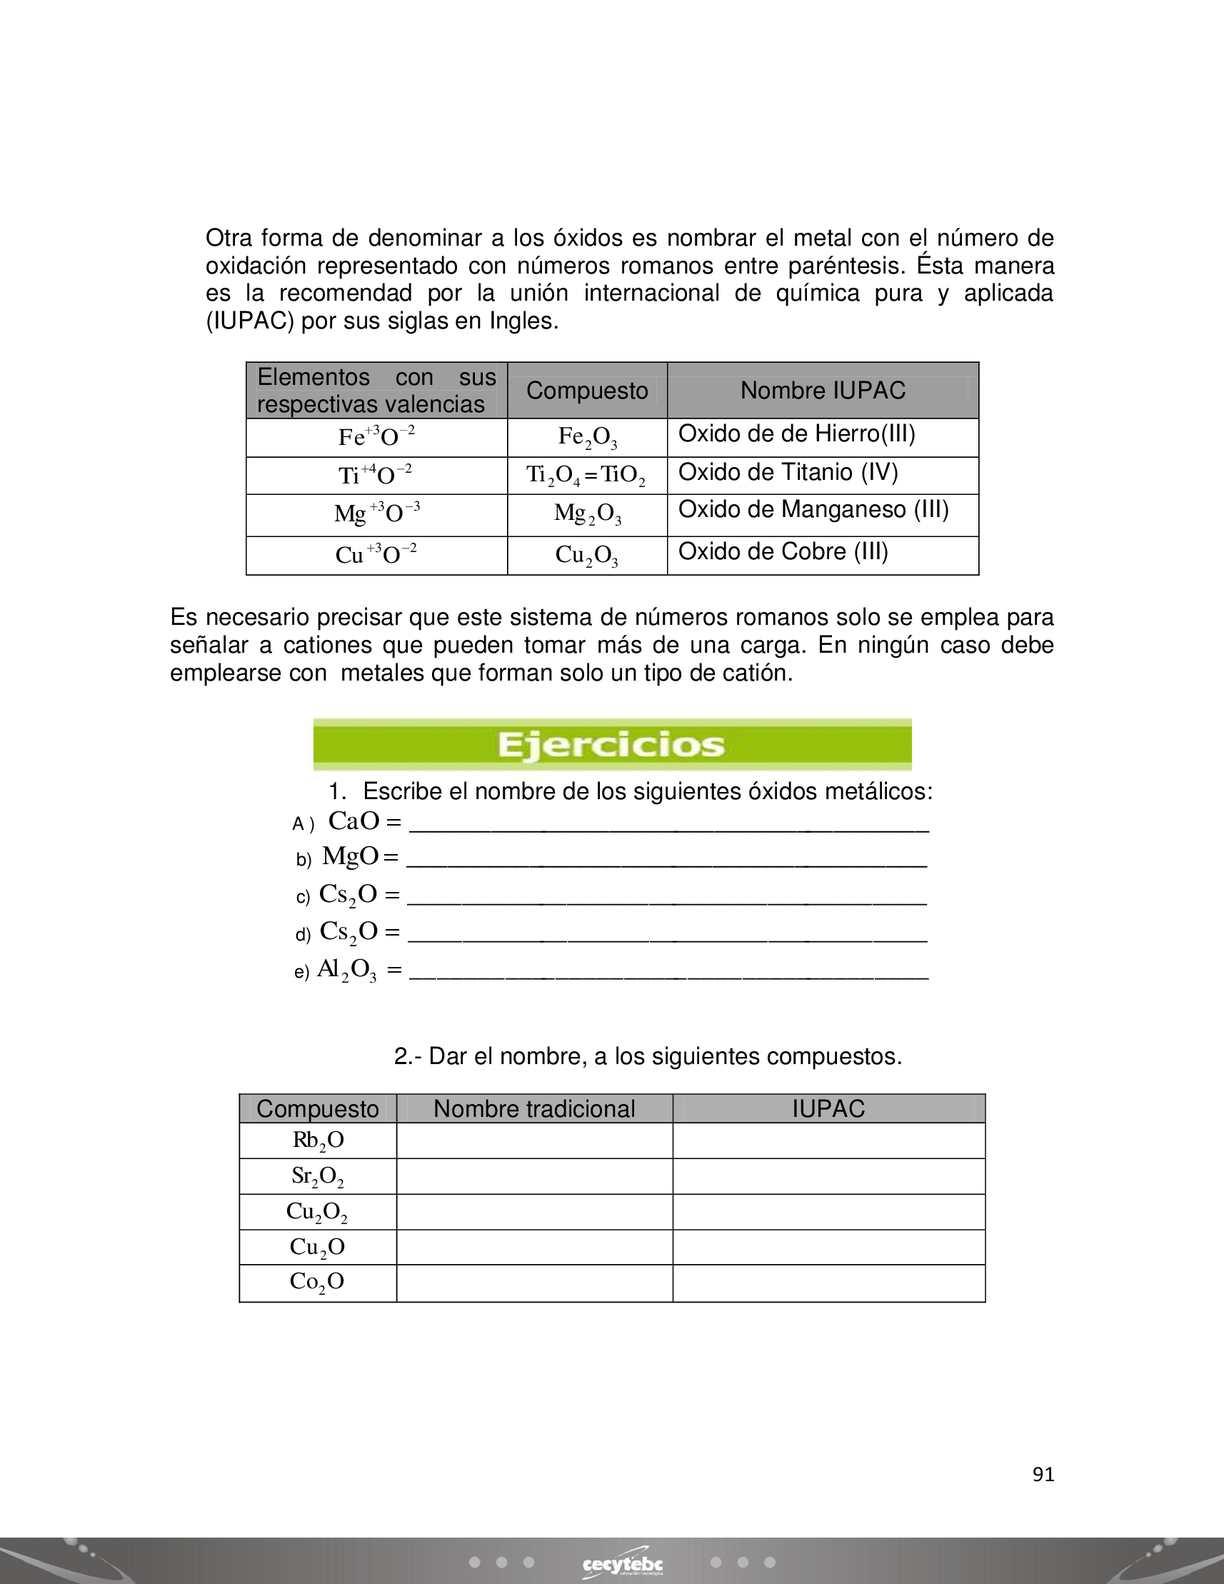 Como Se Escribe 91 En Numeros Romanos quimica - calameo downloader